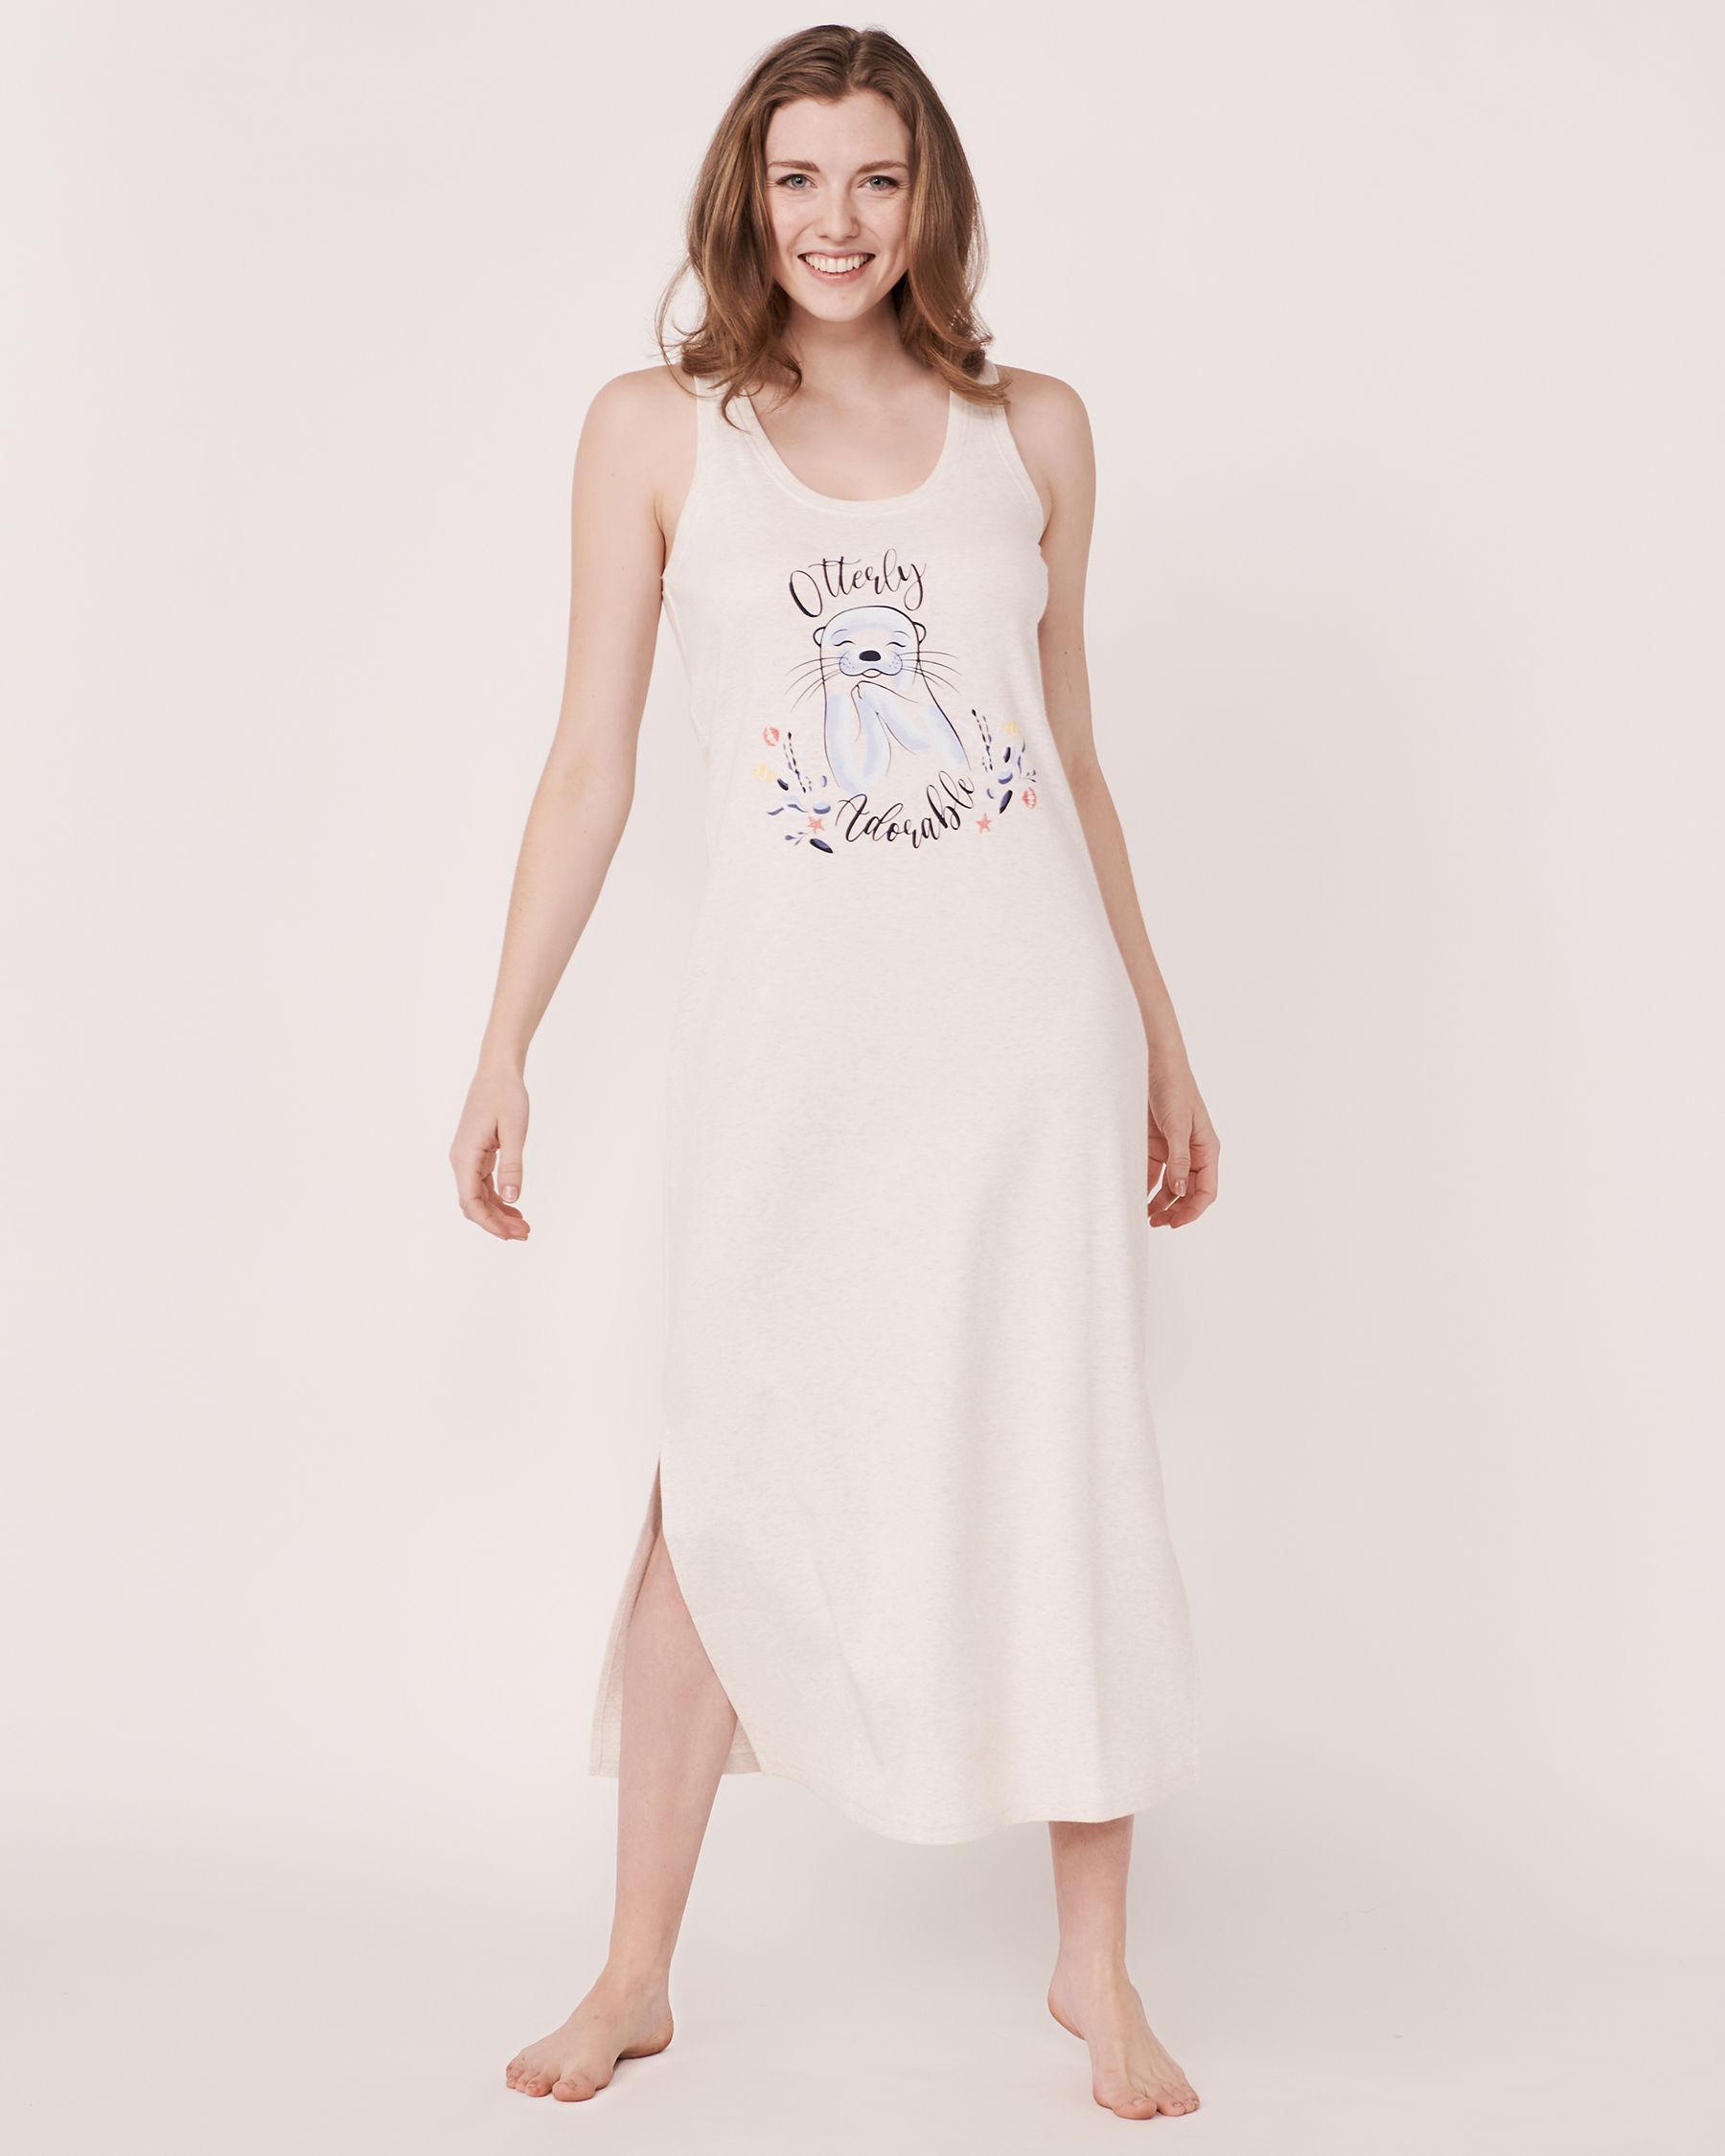 LA VIE EN ROSE Organic Cotton Sleeveless Long Sleepshirt Soft grey 40500002 - View3